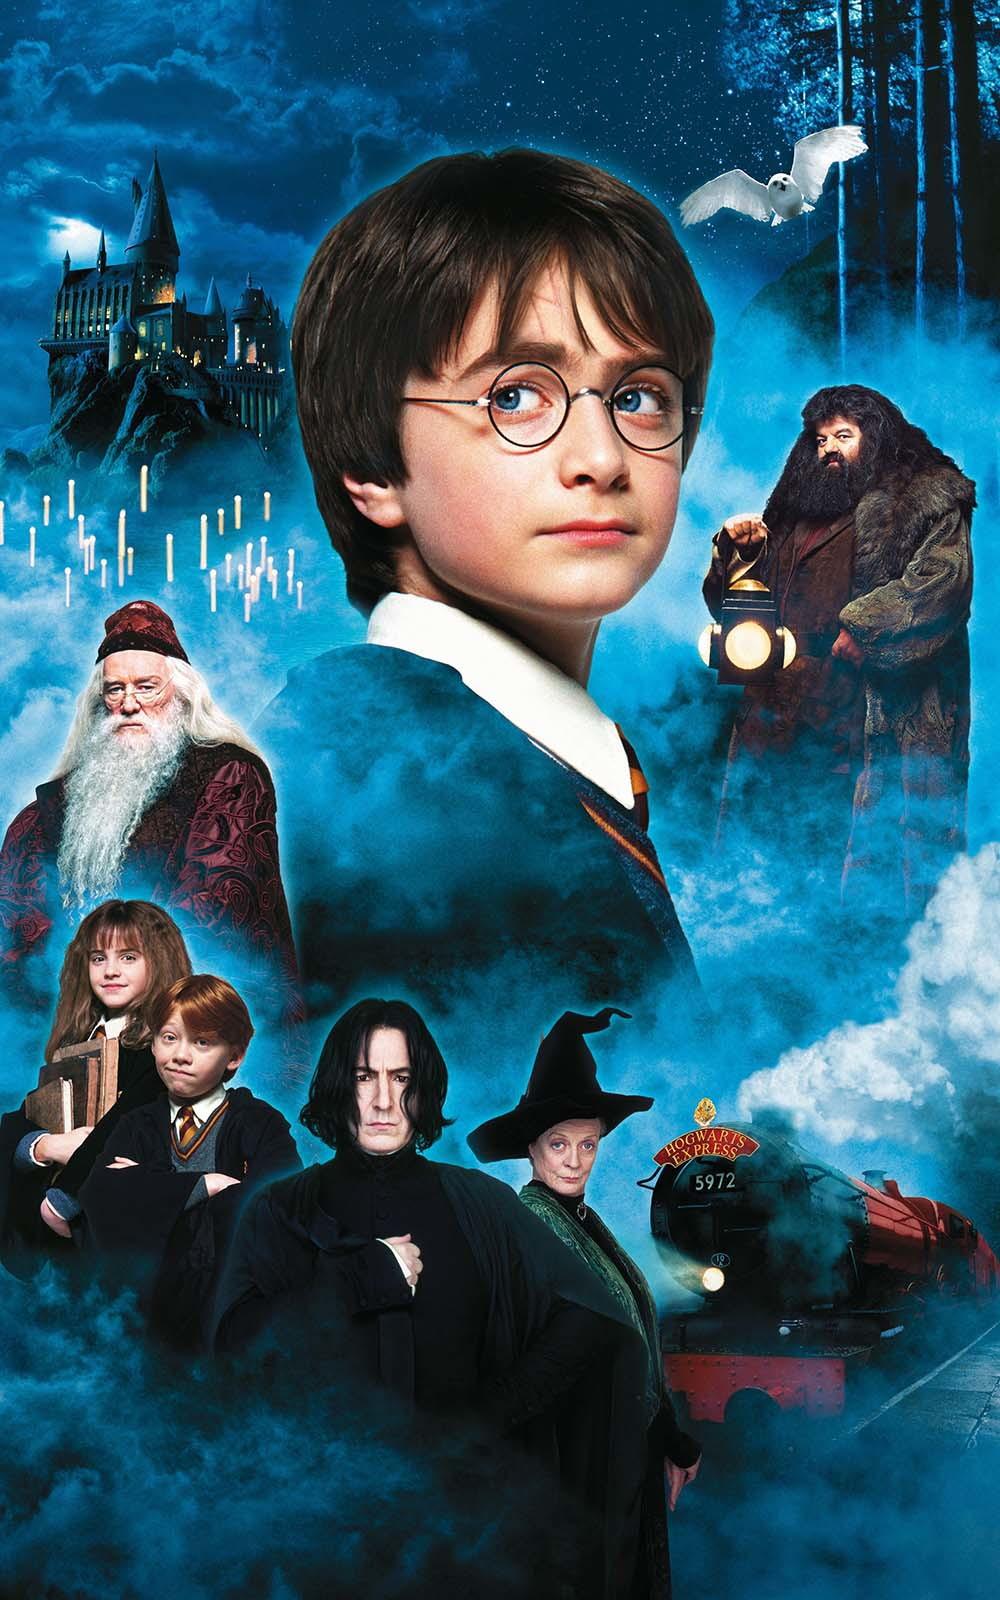 Big Poster Harry Potter e a Pedra Filosofal LO03 90x60 cm no Elo7 ...